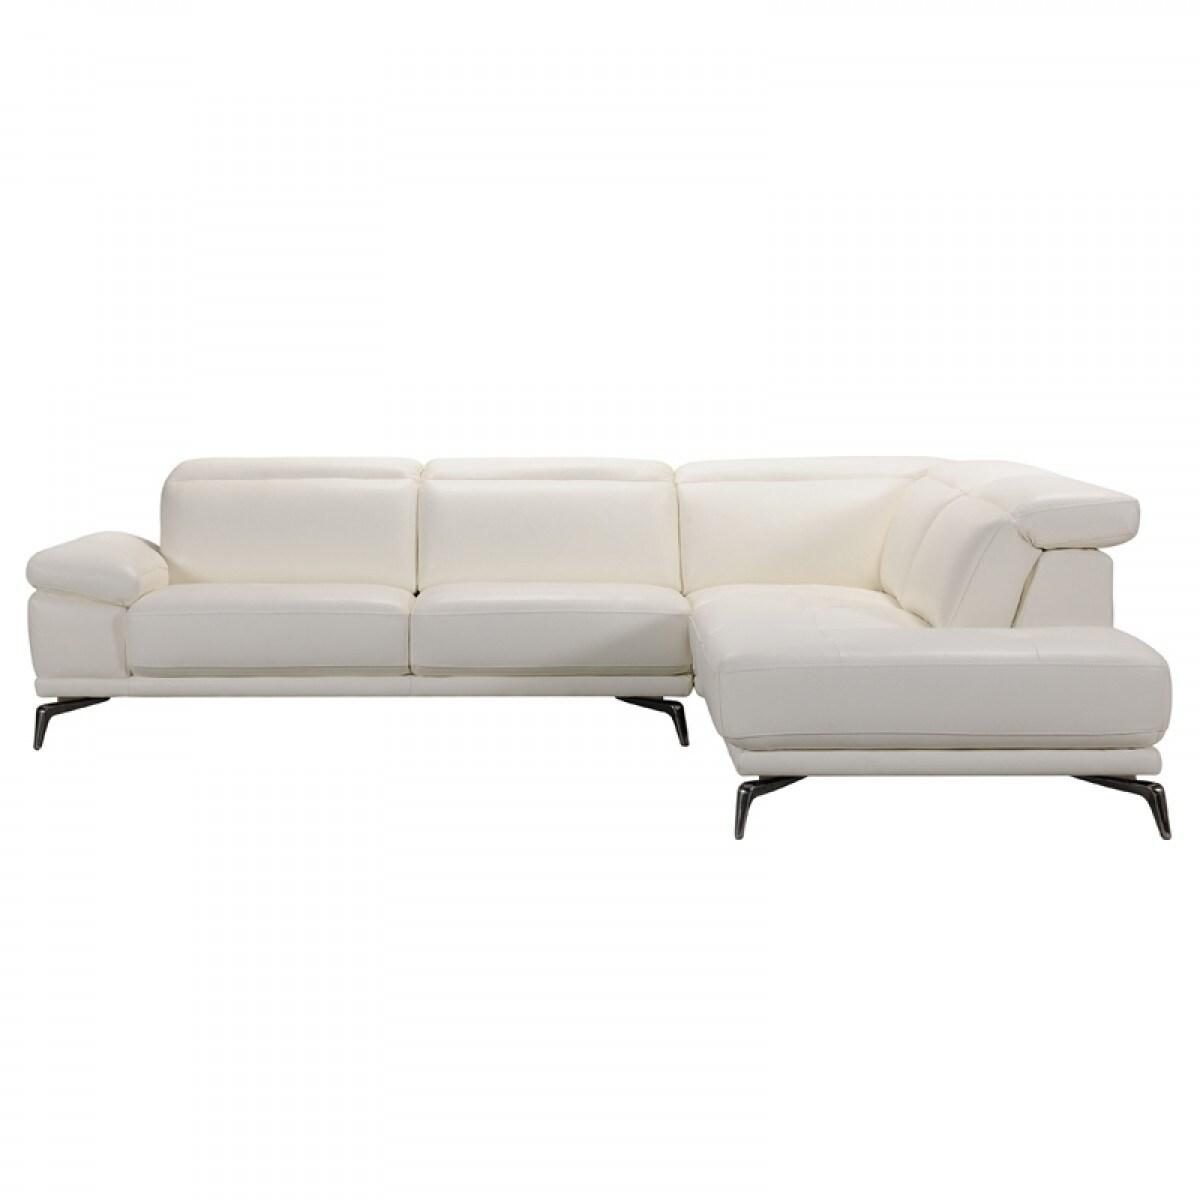 Admirable Divani Casa Tundra Modern White Leather Sectional Sofa Evergreenethics Interior Chair Design Evergreenethicsorg